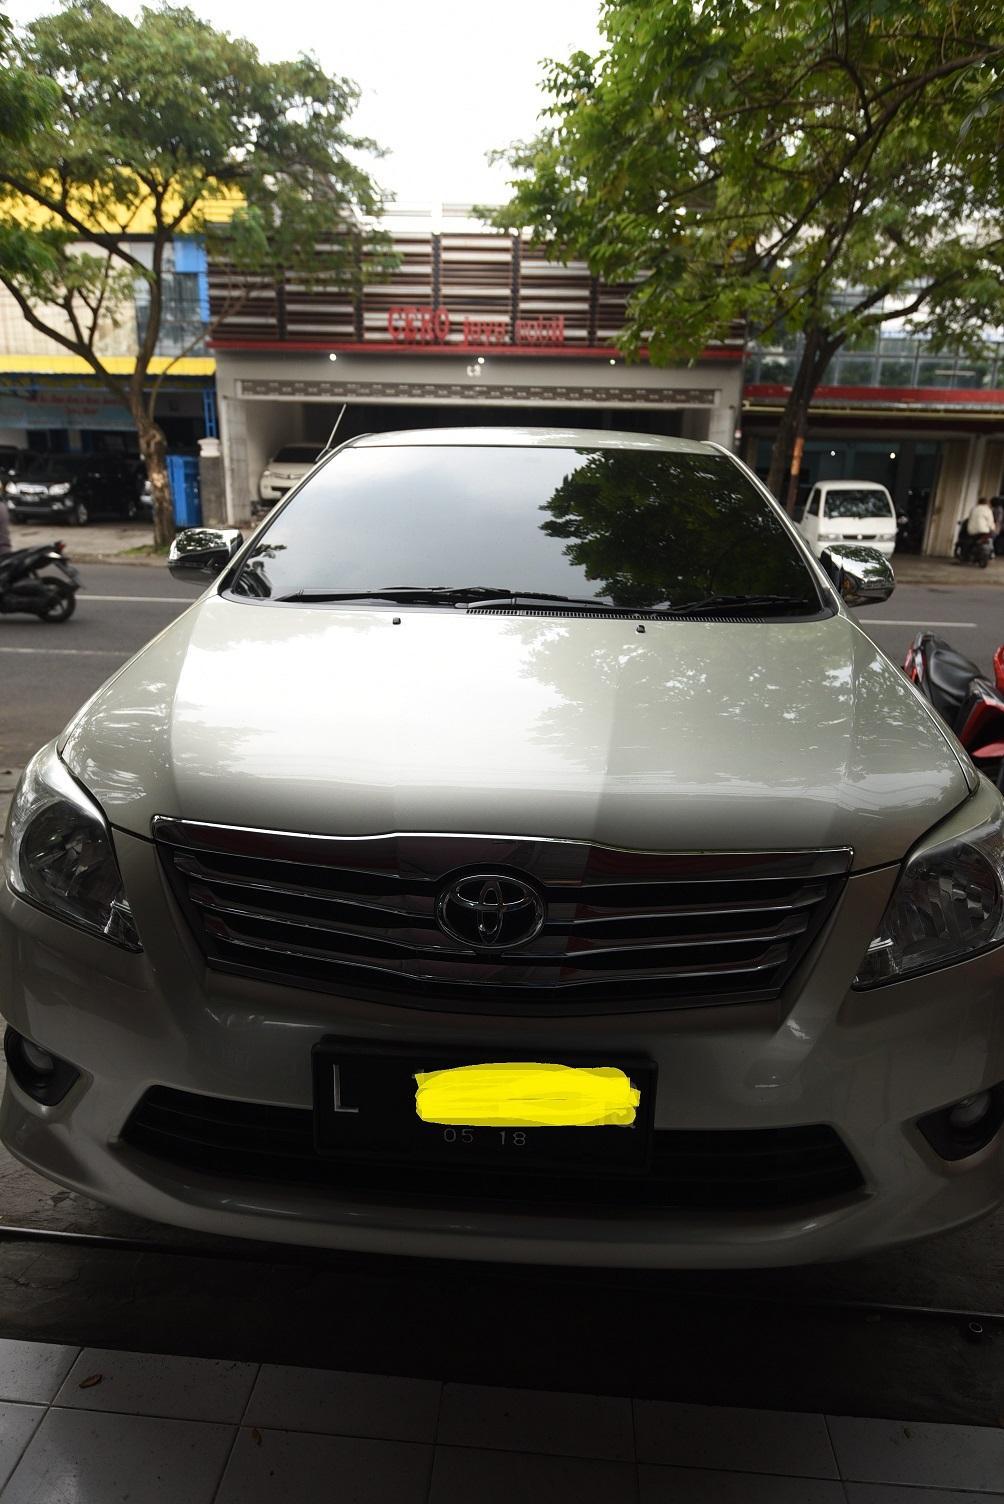 Autofriend Garnish Pelindung Ai Lz 015 Toyota Innova 2012 2013 2014 3232 Honda Hrv H Rv 2015 2016 On Foglamp Cover G Bensin At 5